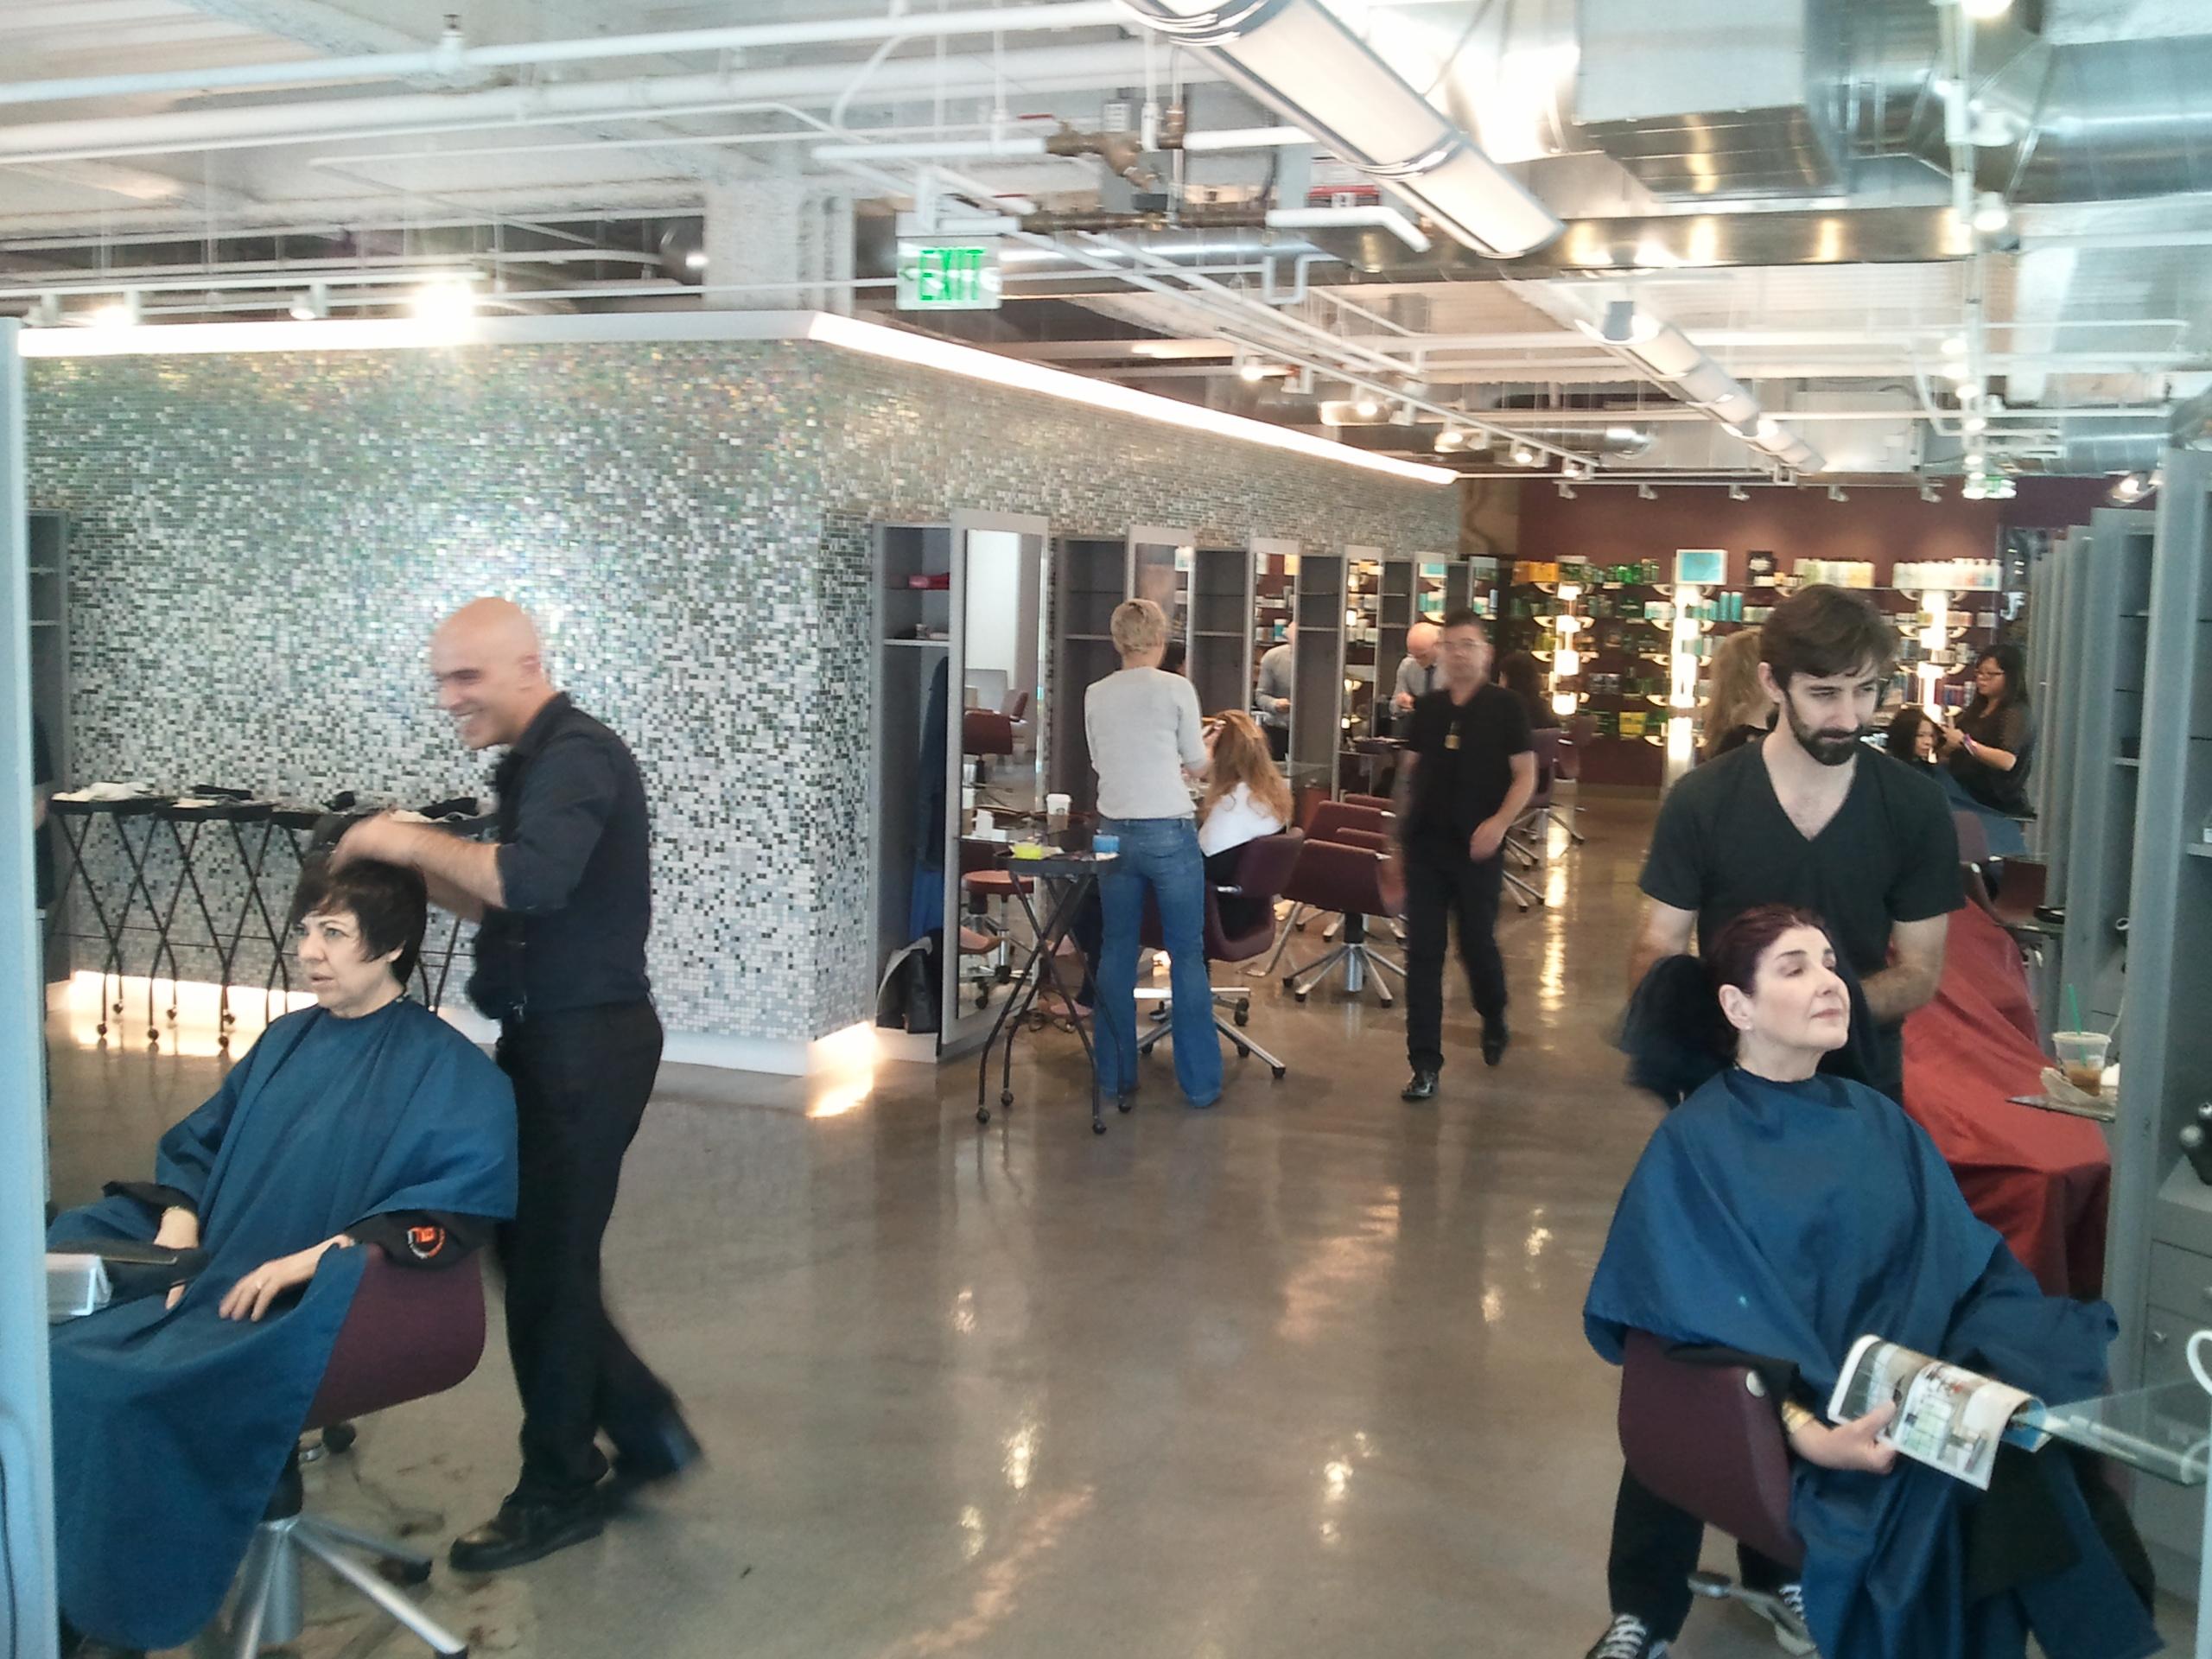 Offres d'emploi coiffure etats unis